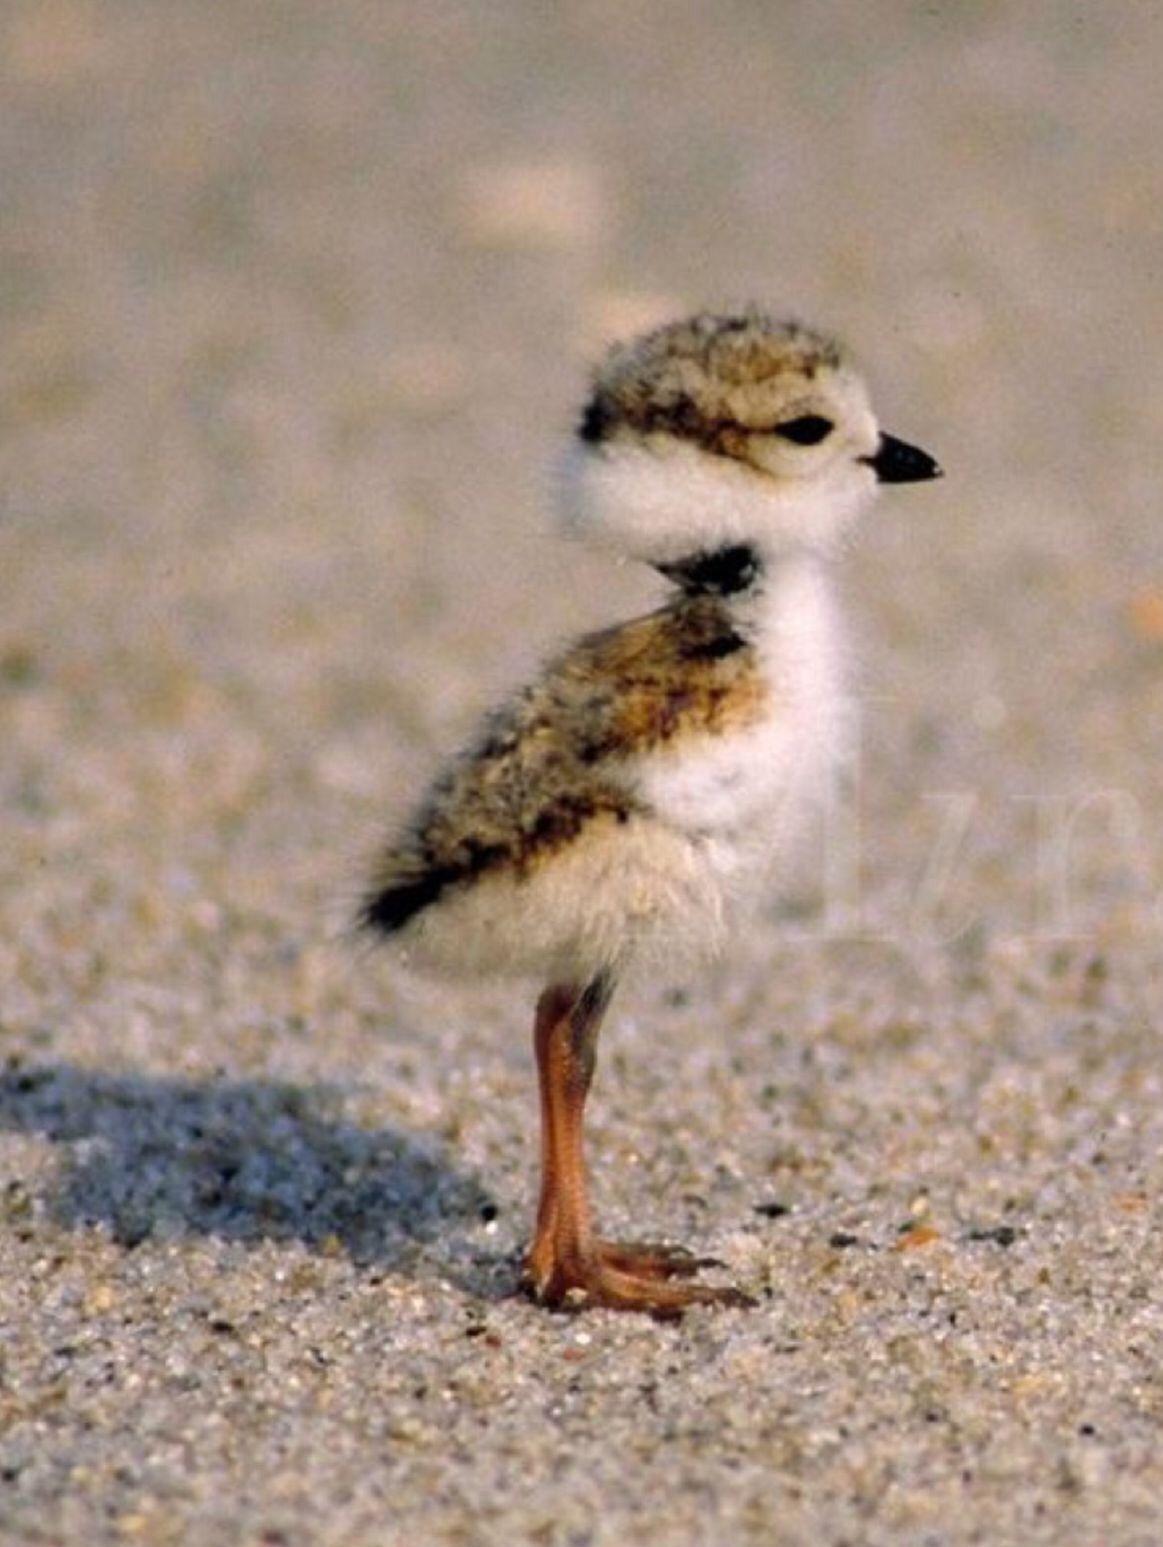 Pin By Nikki Rensje On Nature Animals Cute Animals Cute Baby Animals